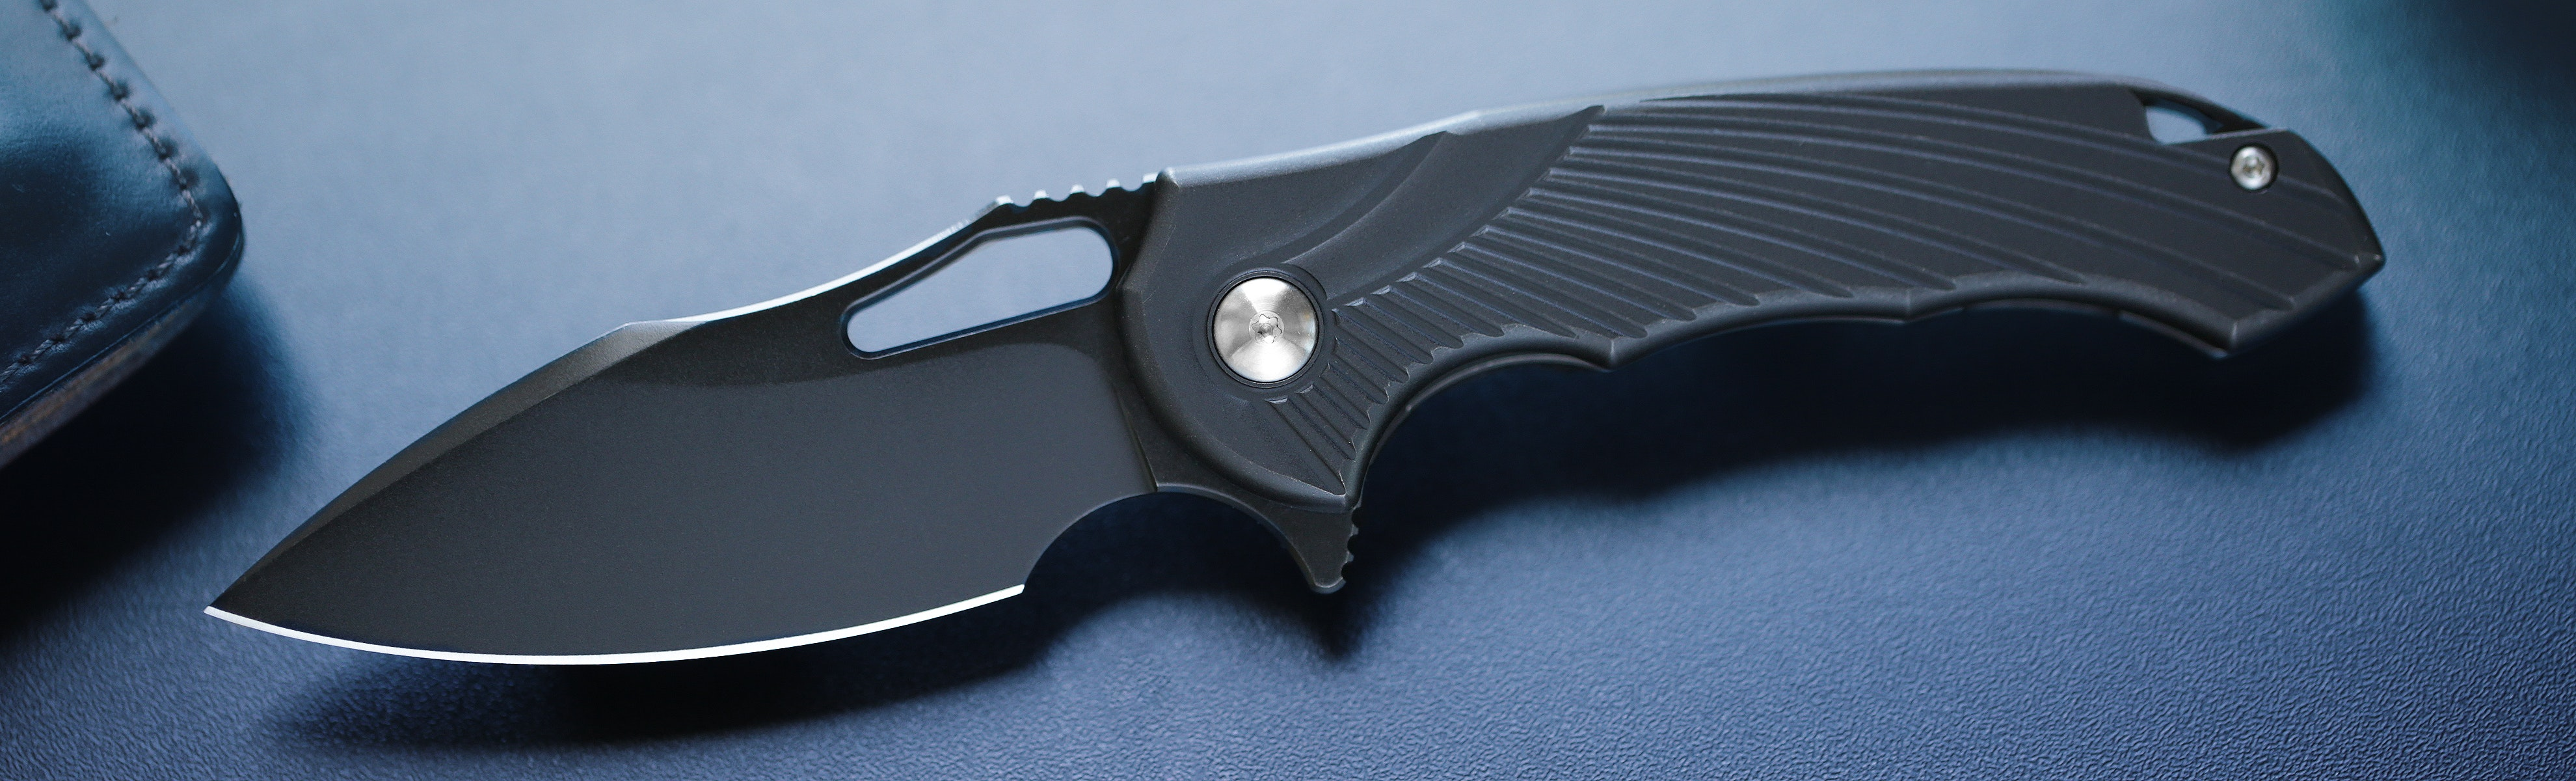 Massdrop x Ferrum Forge Falcon Wing Edition